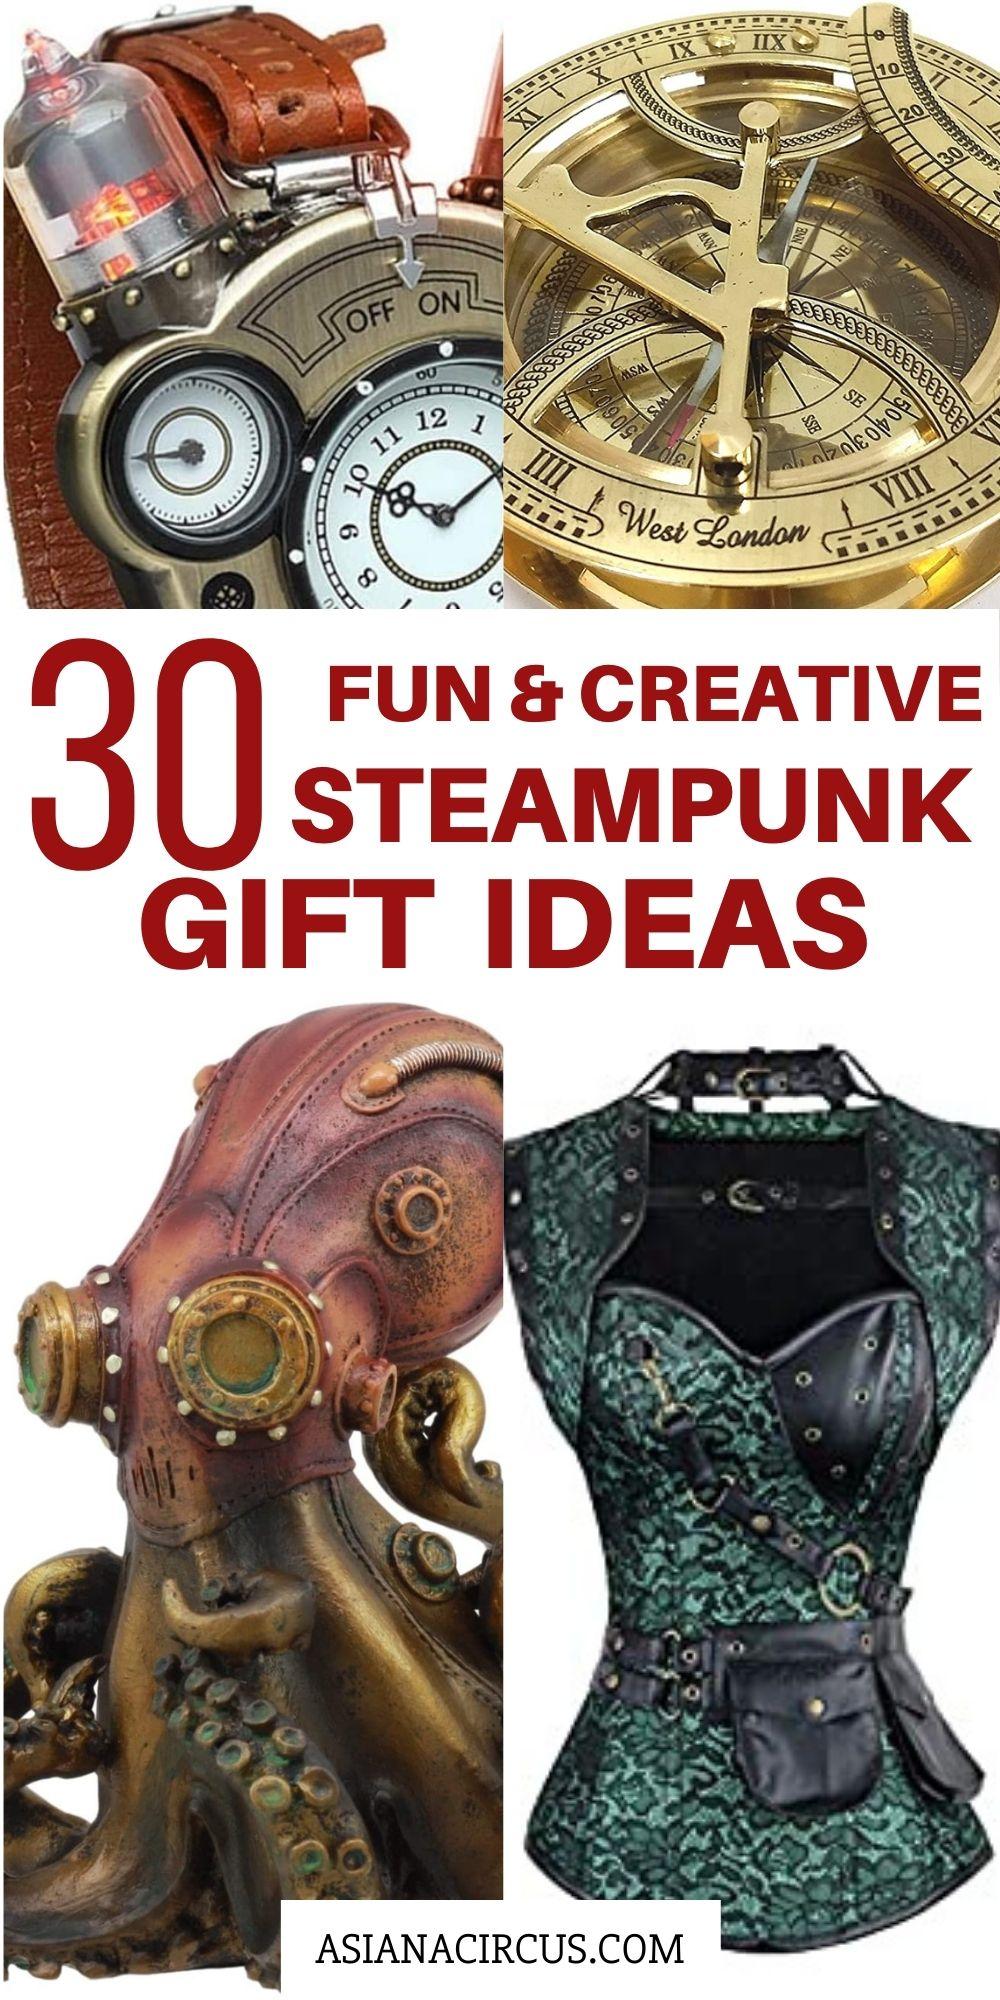 30 steampunk gift ideas